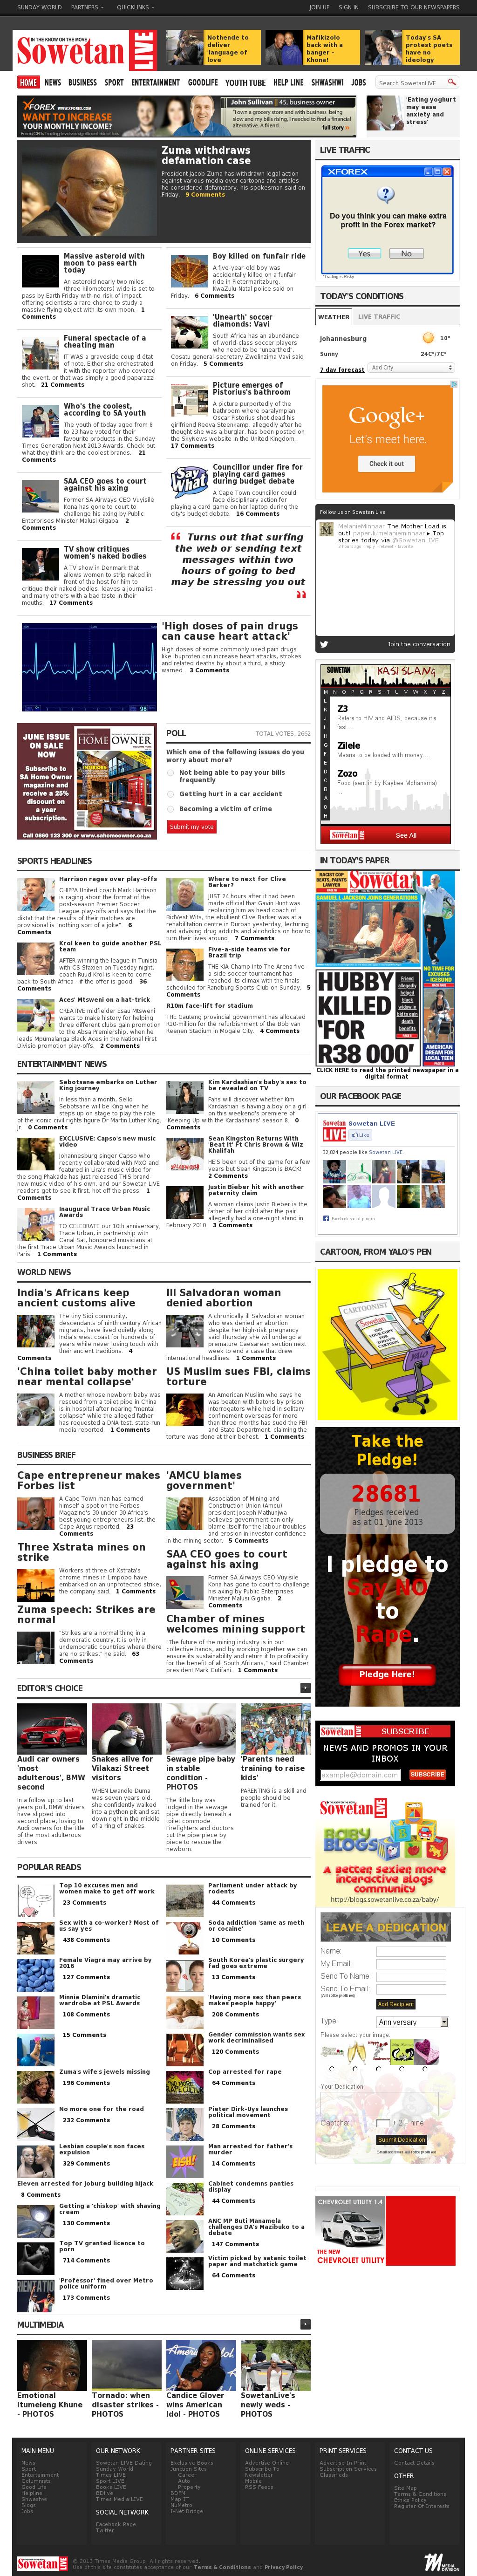 Sowetan Live at Saturday June 1, 2013, 12:24 a.m. UTC